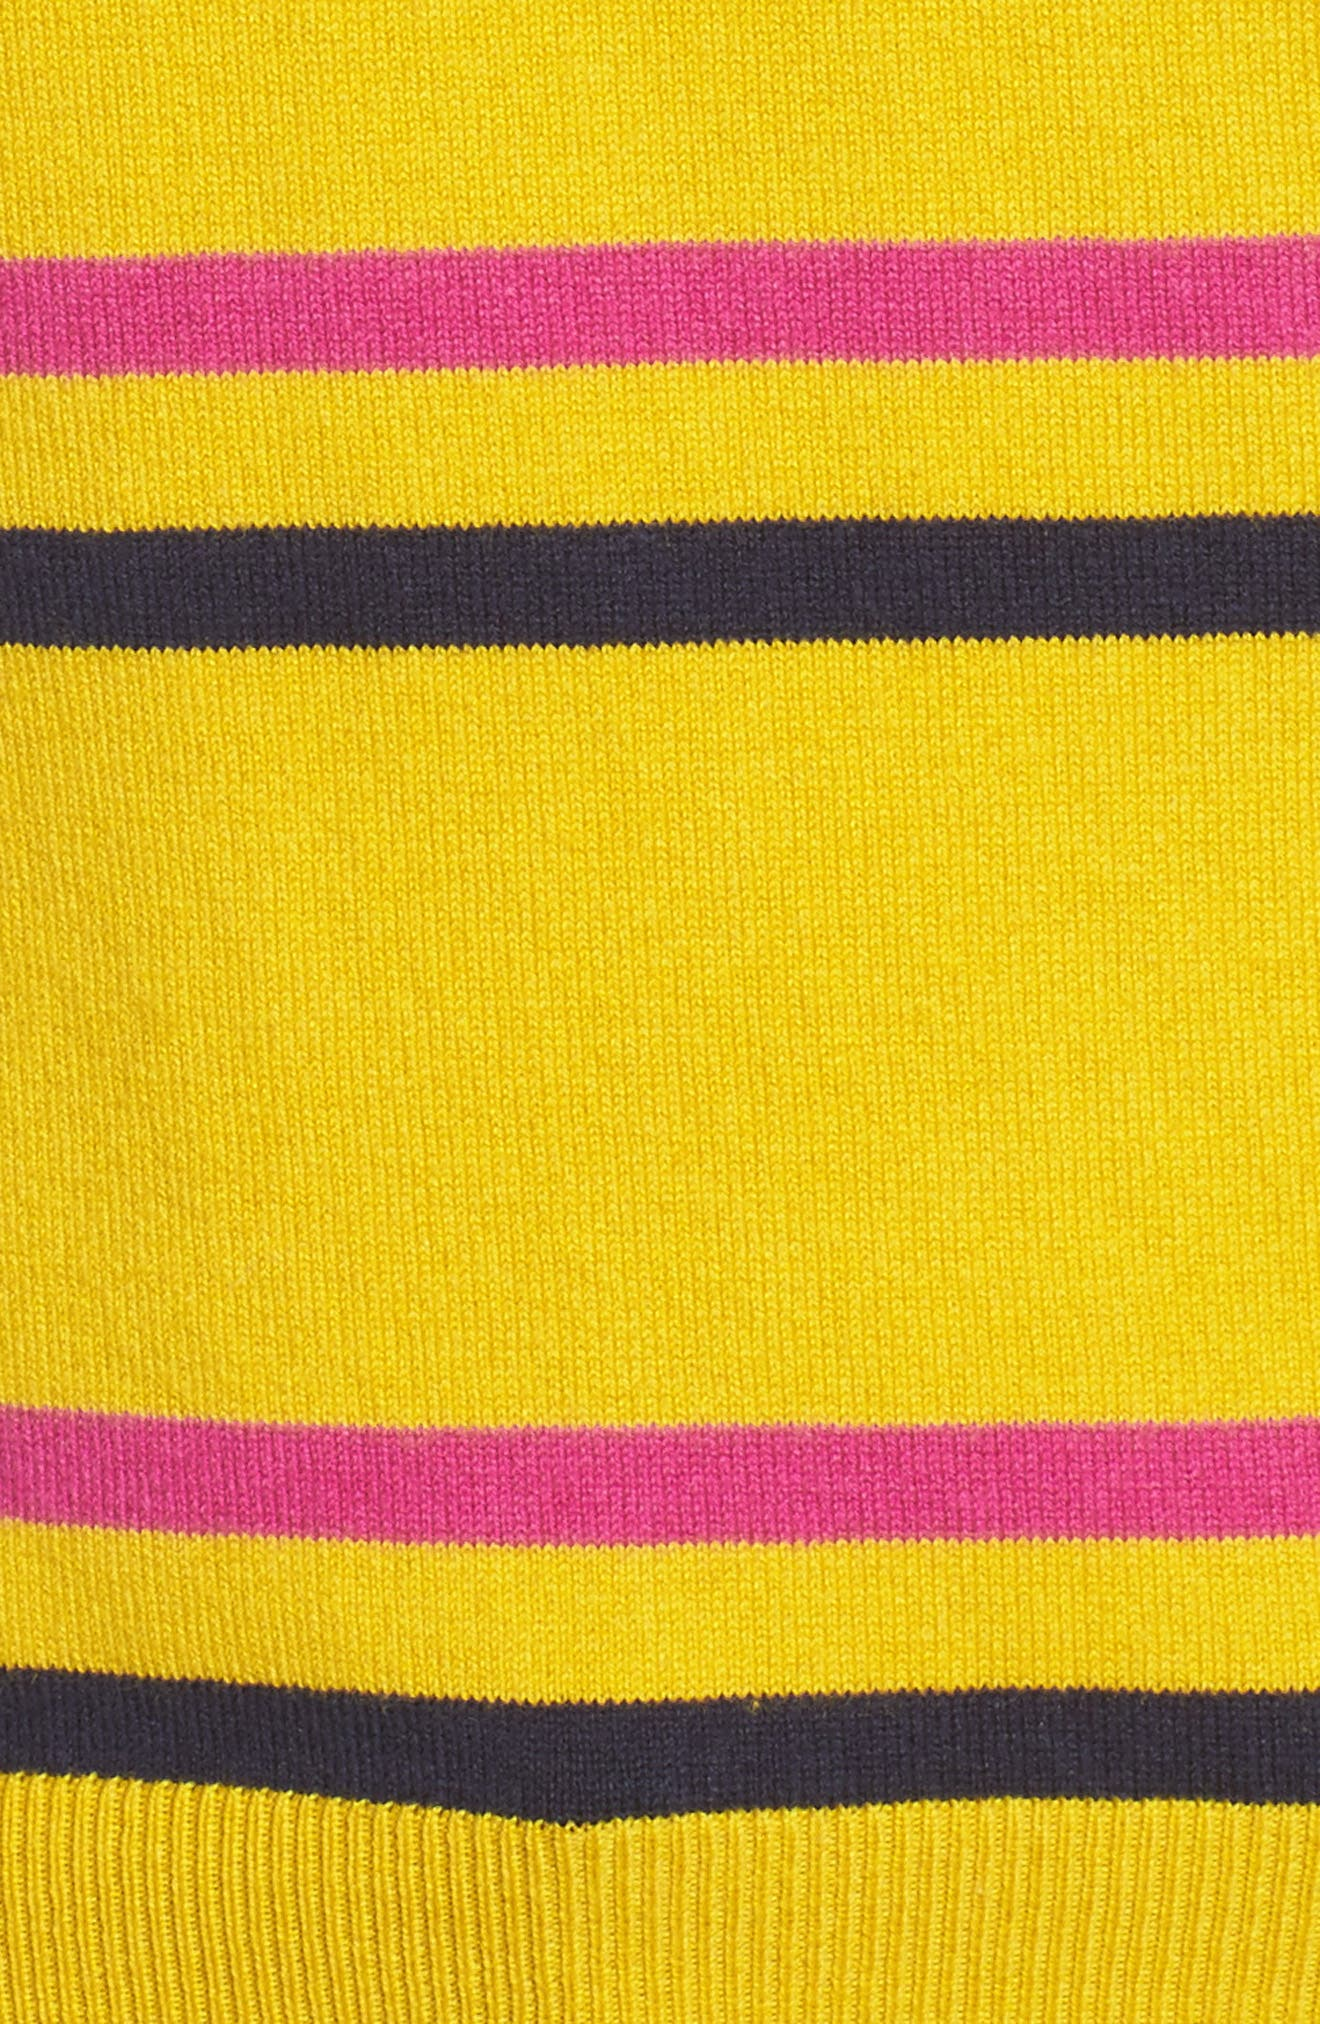 Ruffle Yoke Sweater,                             Alternate thumbnail 6, color,                             Yellow Sulfur Margret Stripe